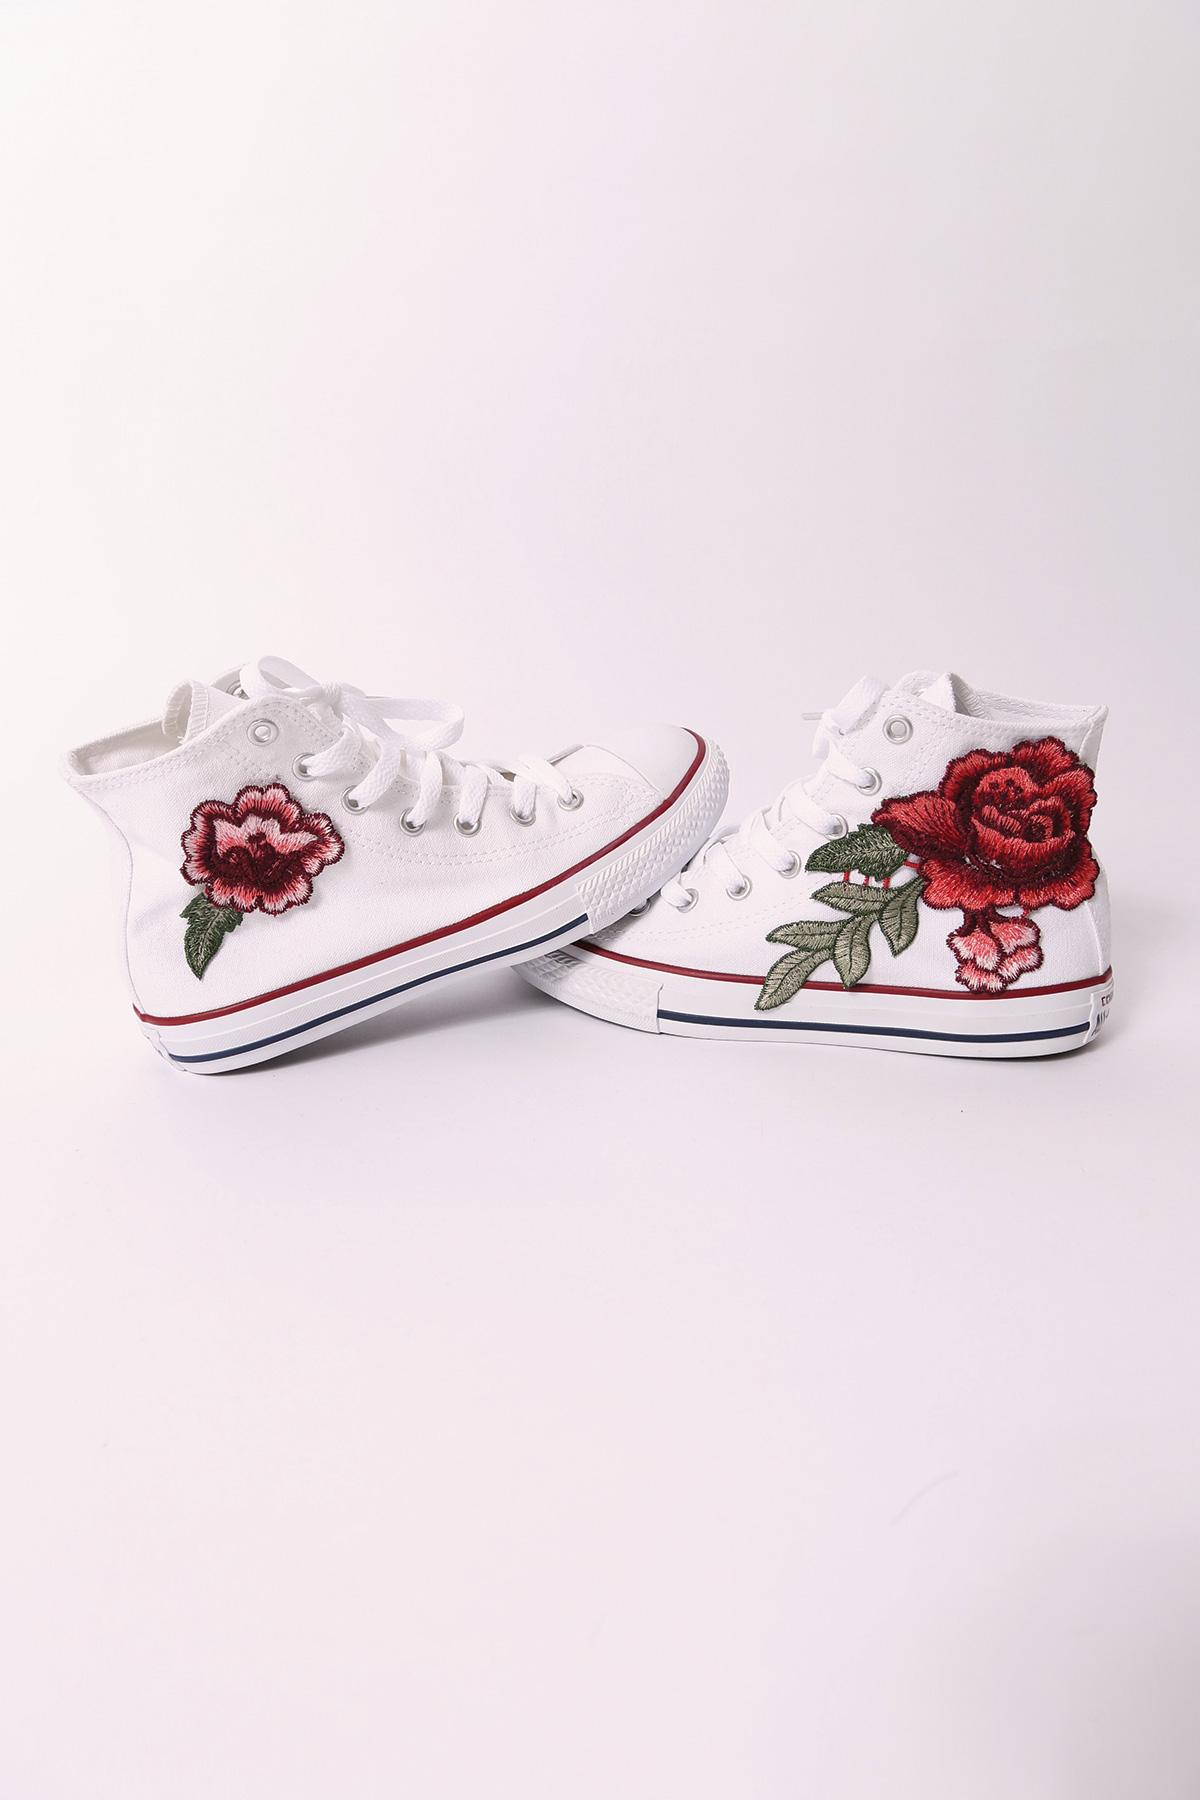 2converse rose